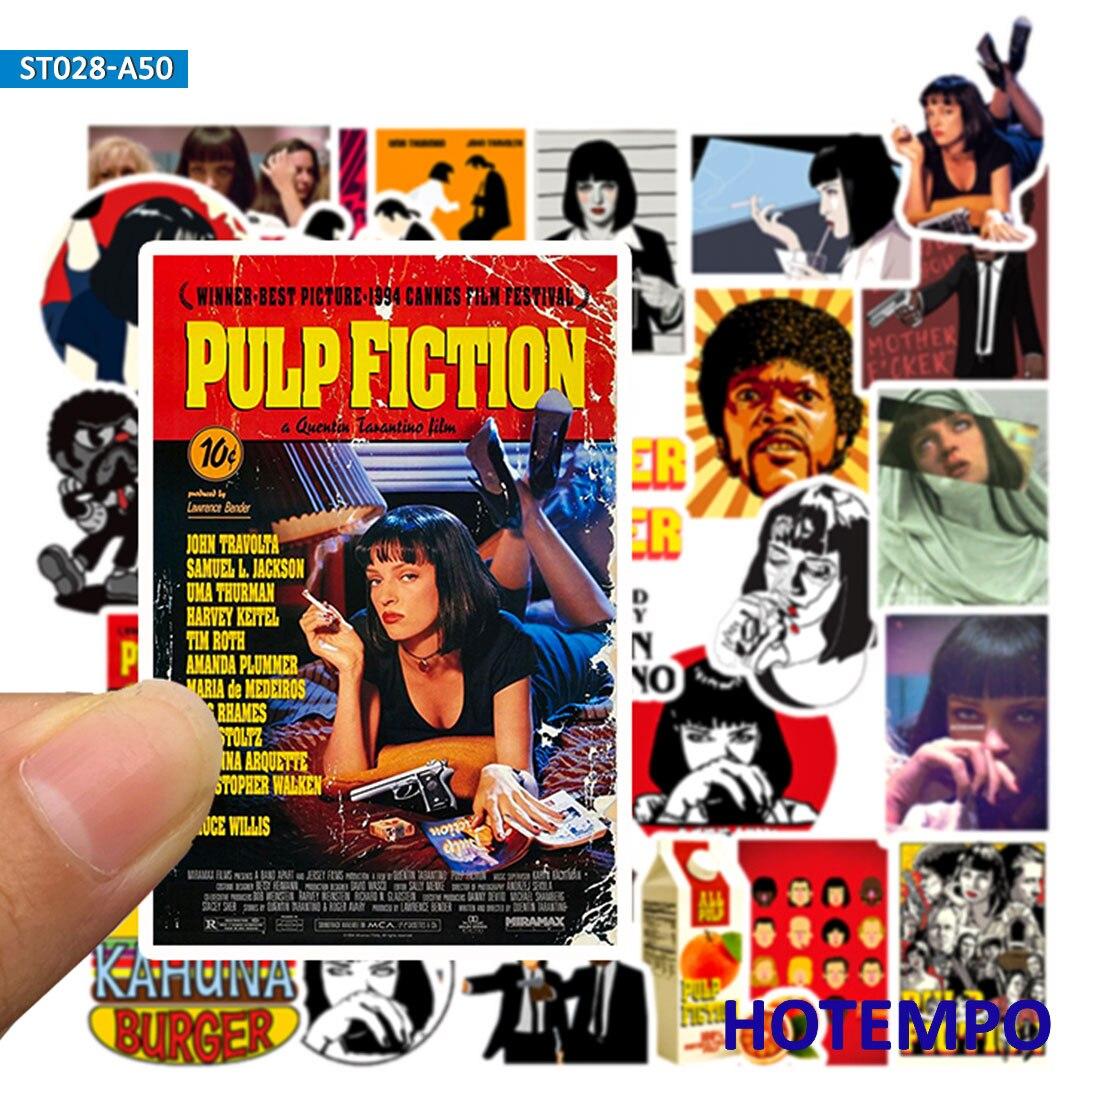 50 stücke Klassische Film Pulp Fiction Poster Aufkleber für Handy Laptop Gepäck Koffer Gitarre Skateboard Aufkleber Aufkleber